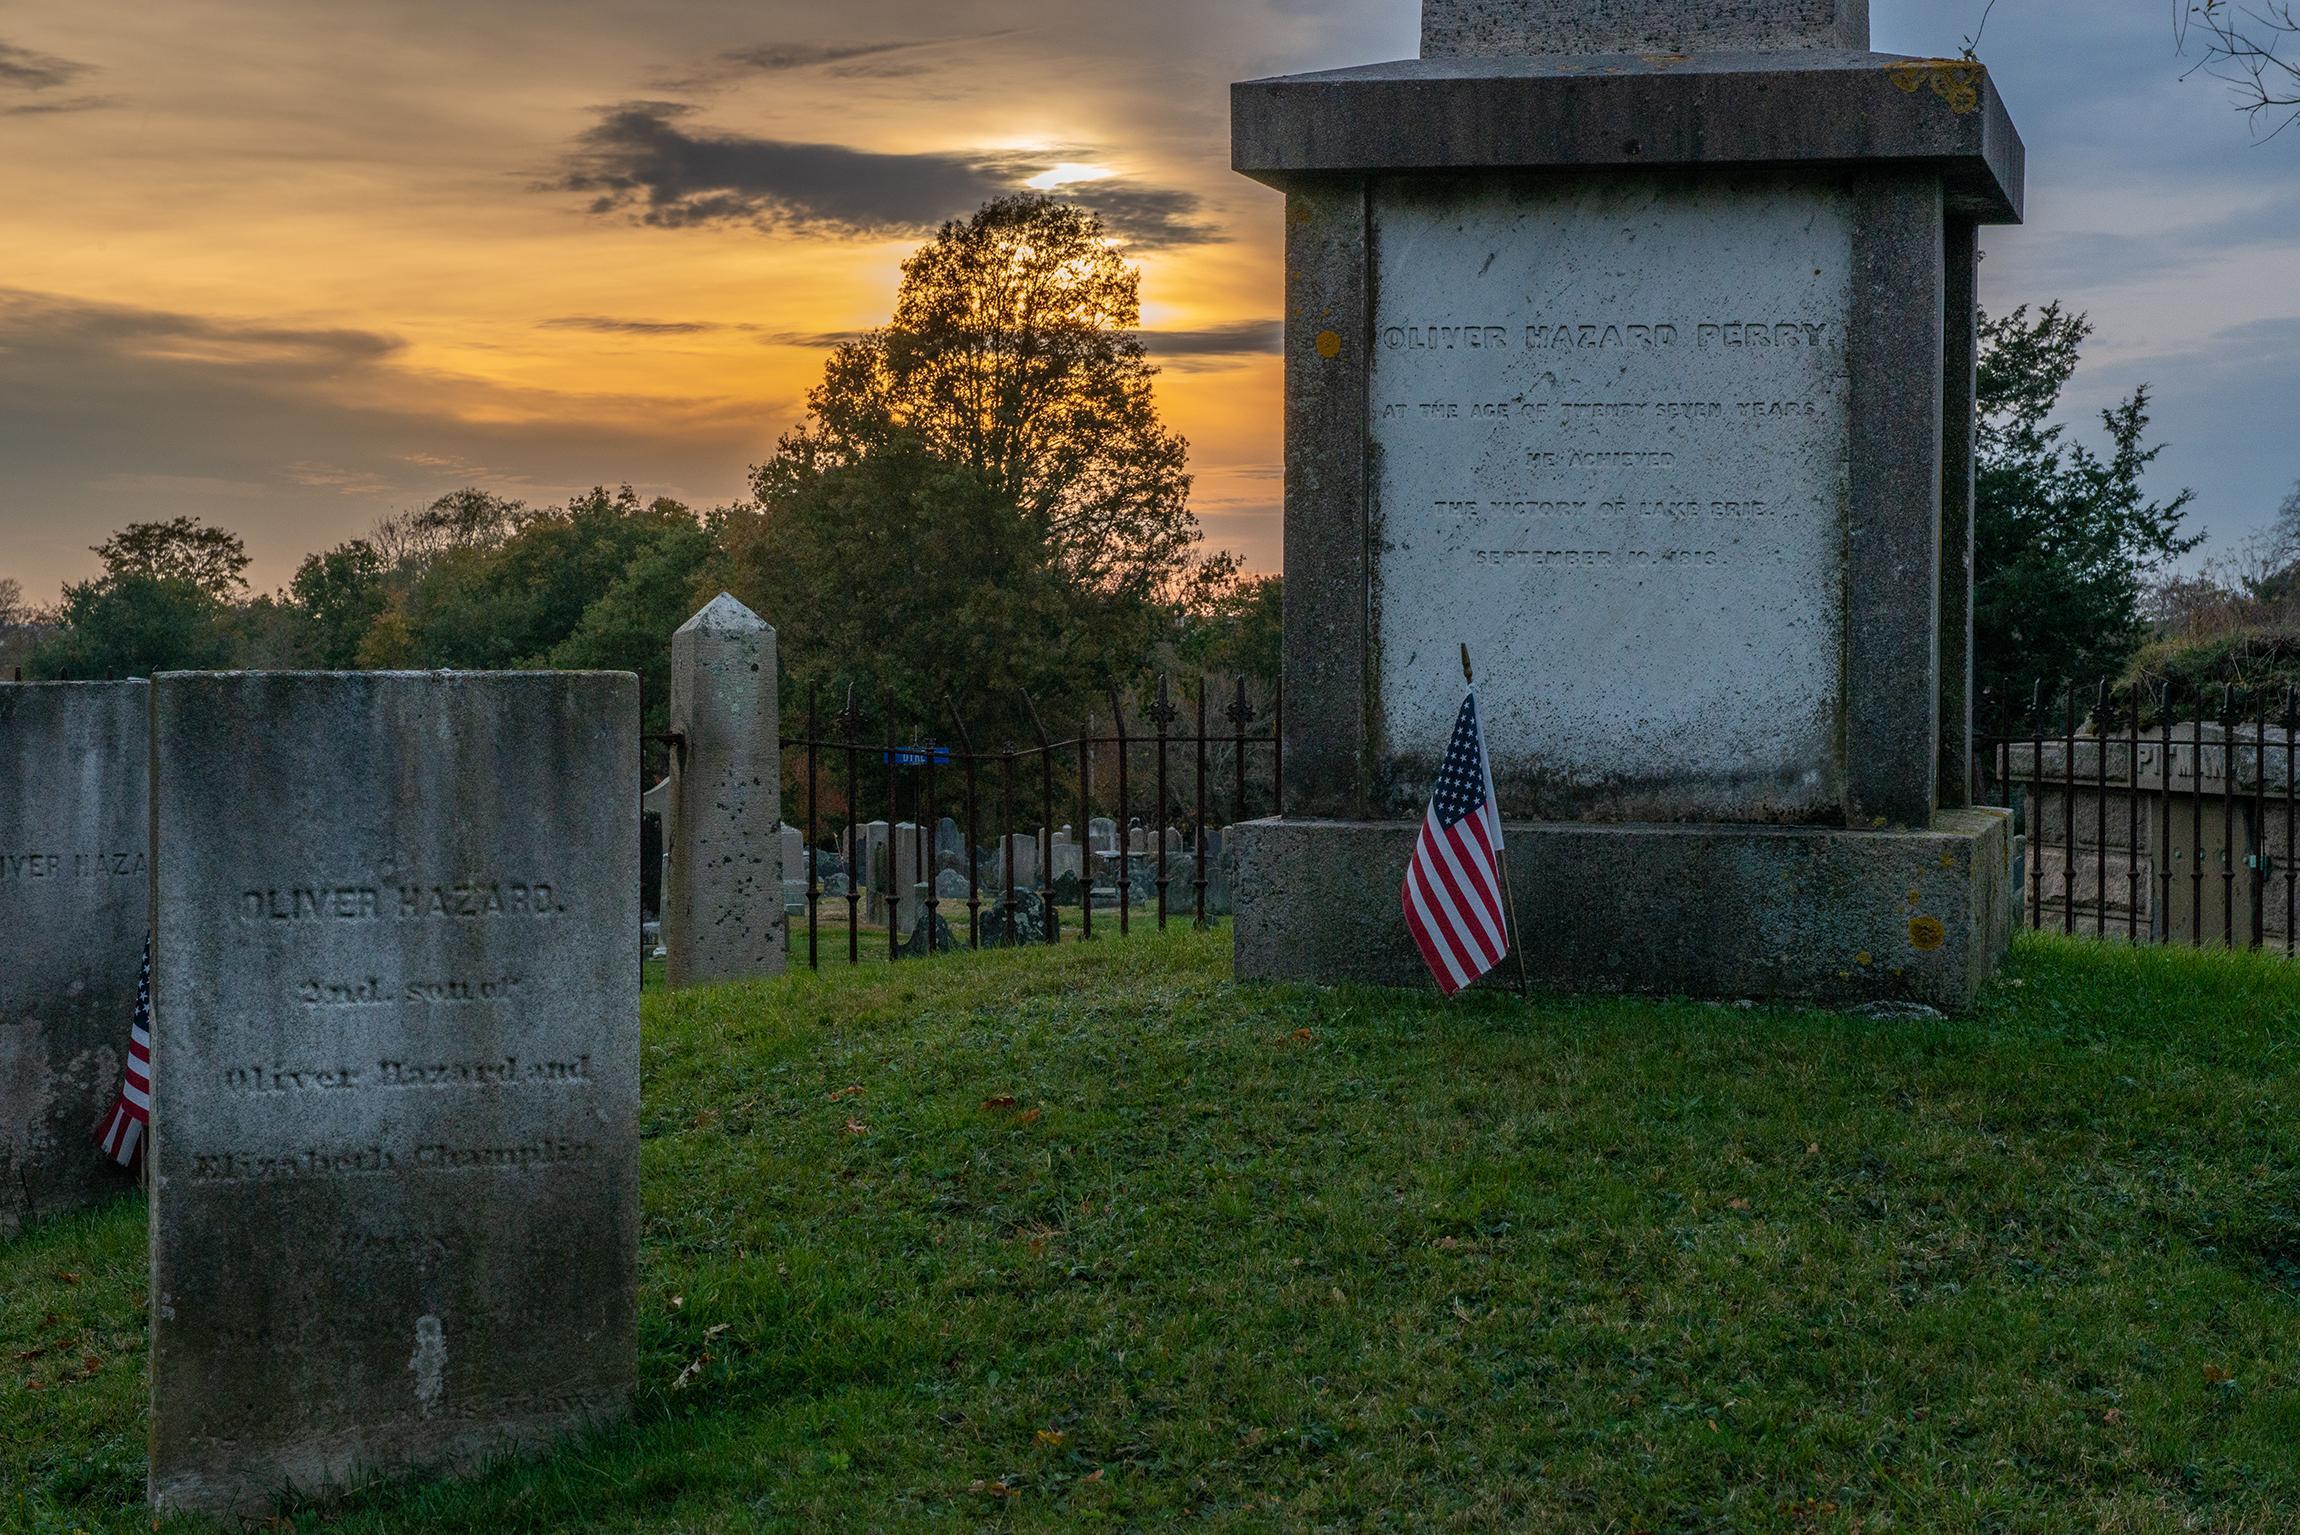 #Oliverhazardperry, #navy, #war, #warhero, #naval, #history, #ancestor, #honor, #gravesite, #family, #thankyou